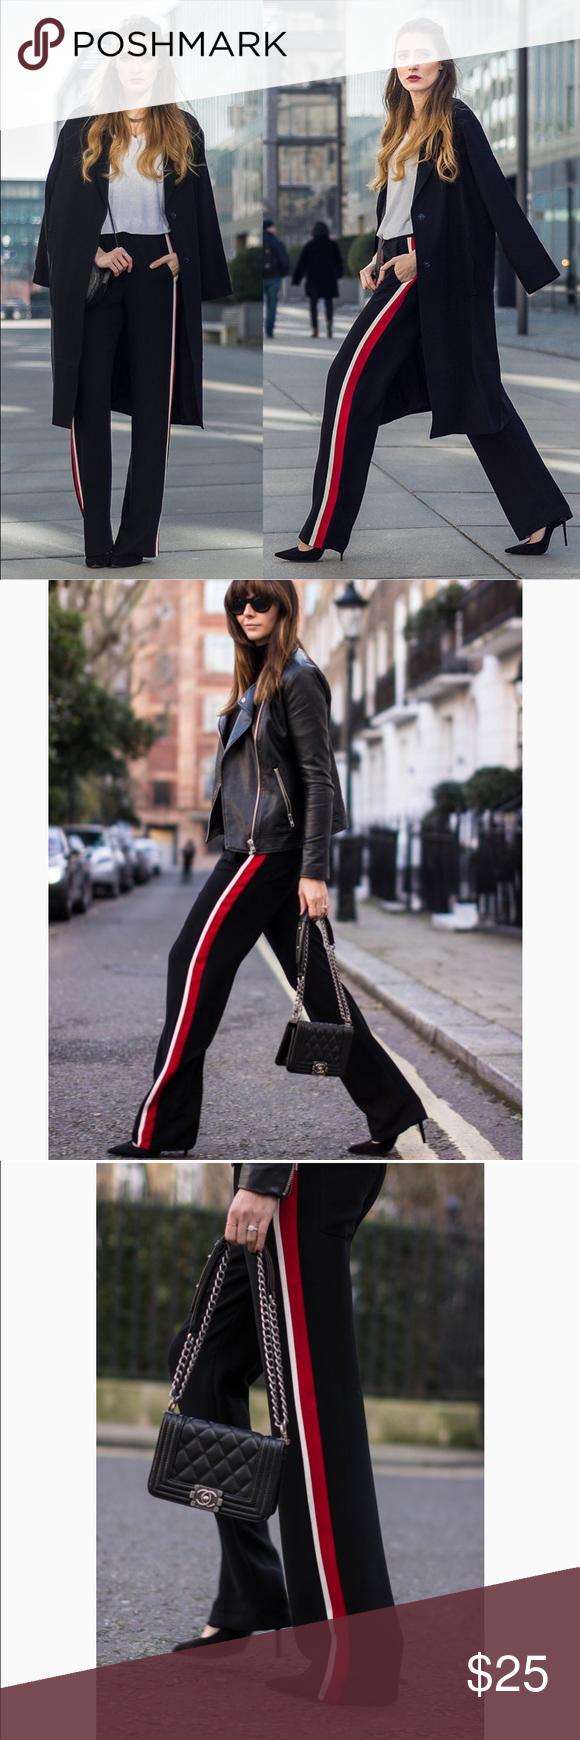 3d71e490 Zara black with red stripe trousers Zara black with red stripe trousers-  EUC- black with red and white stripe going down both sides, elastic  waistband, 2 ...